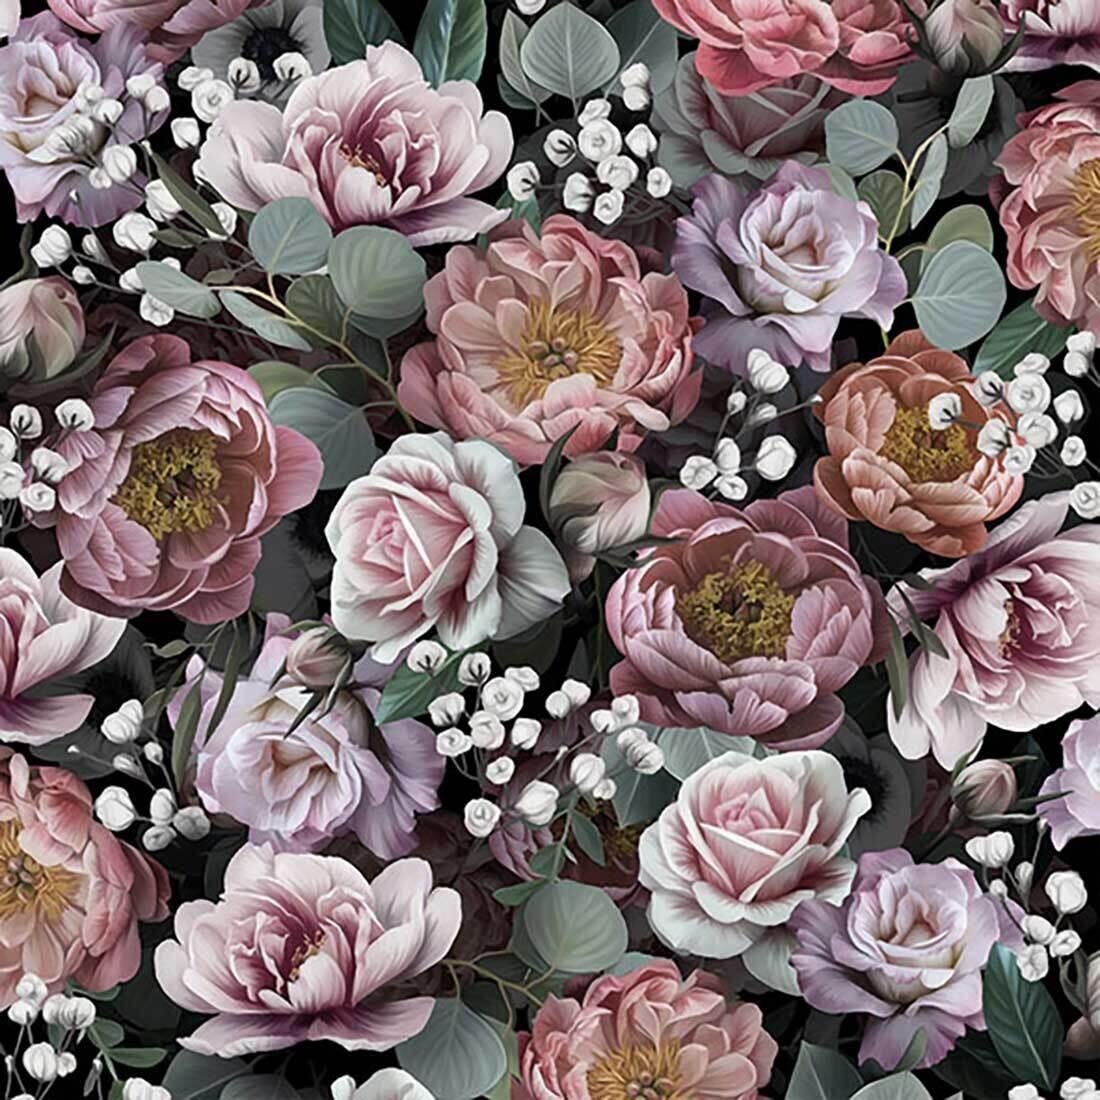 Decoupage Paper Napkins - Floral - Vintage Flowers Black (1 Sheet)